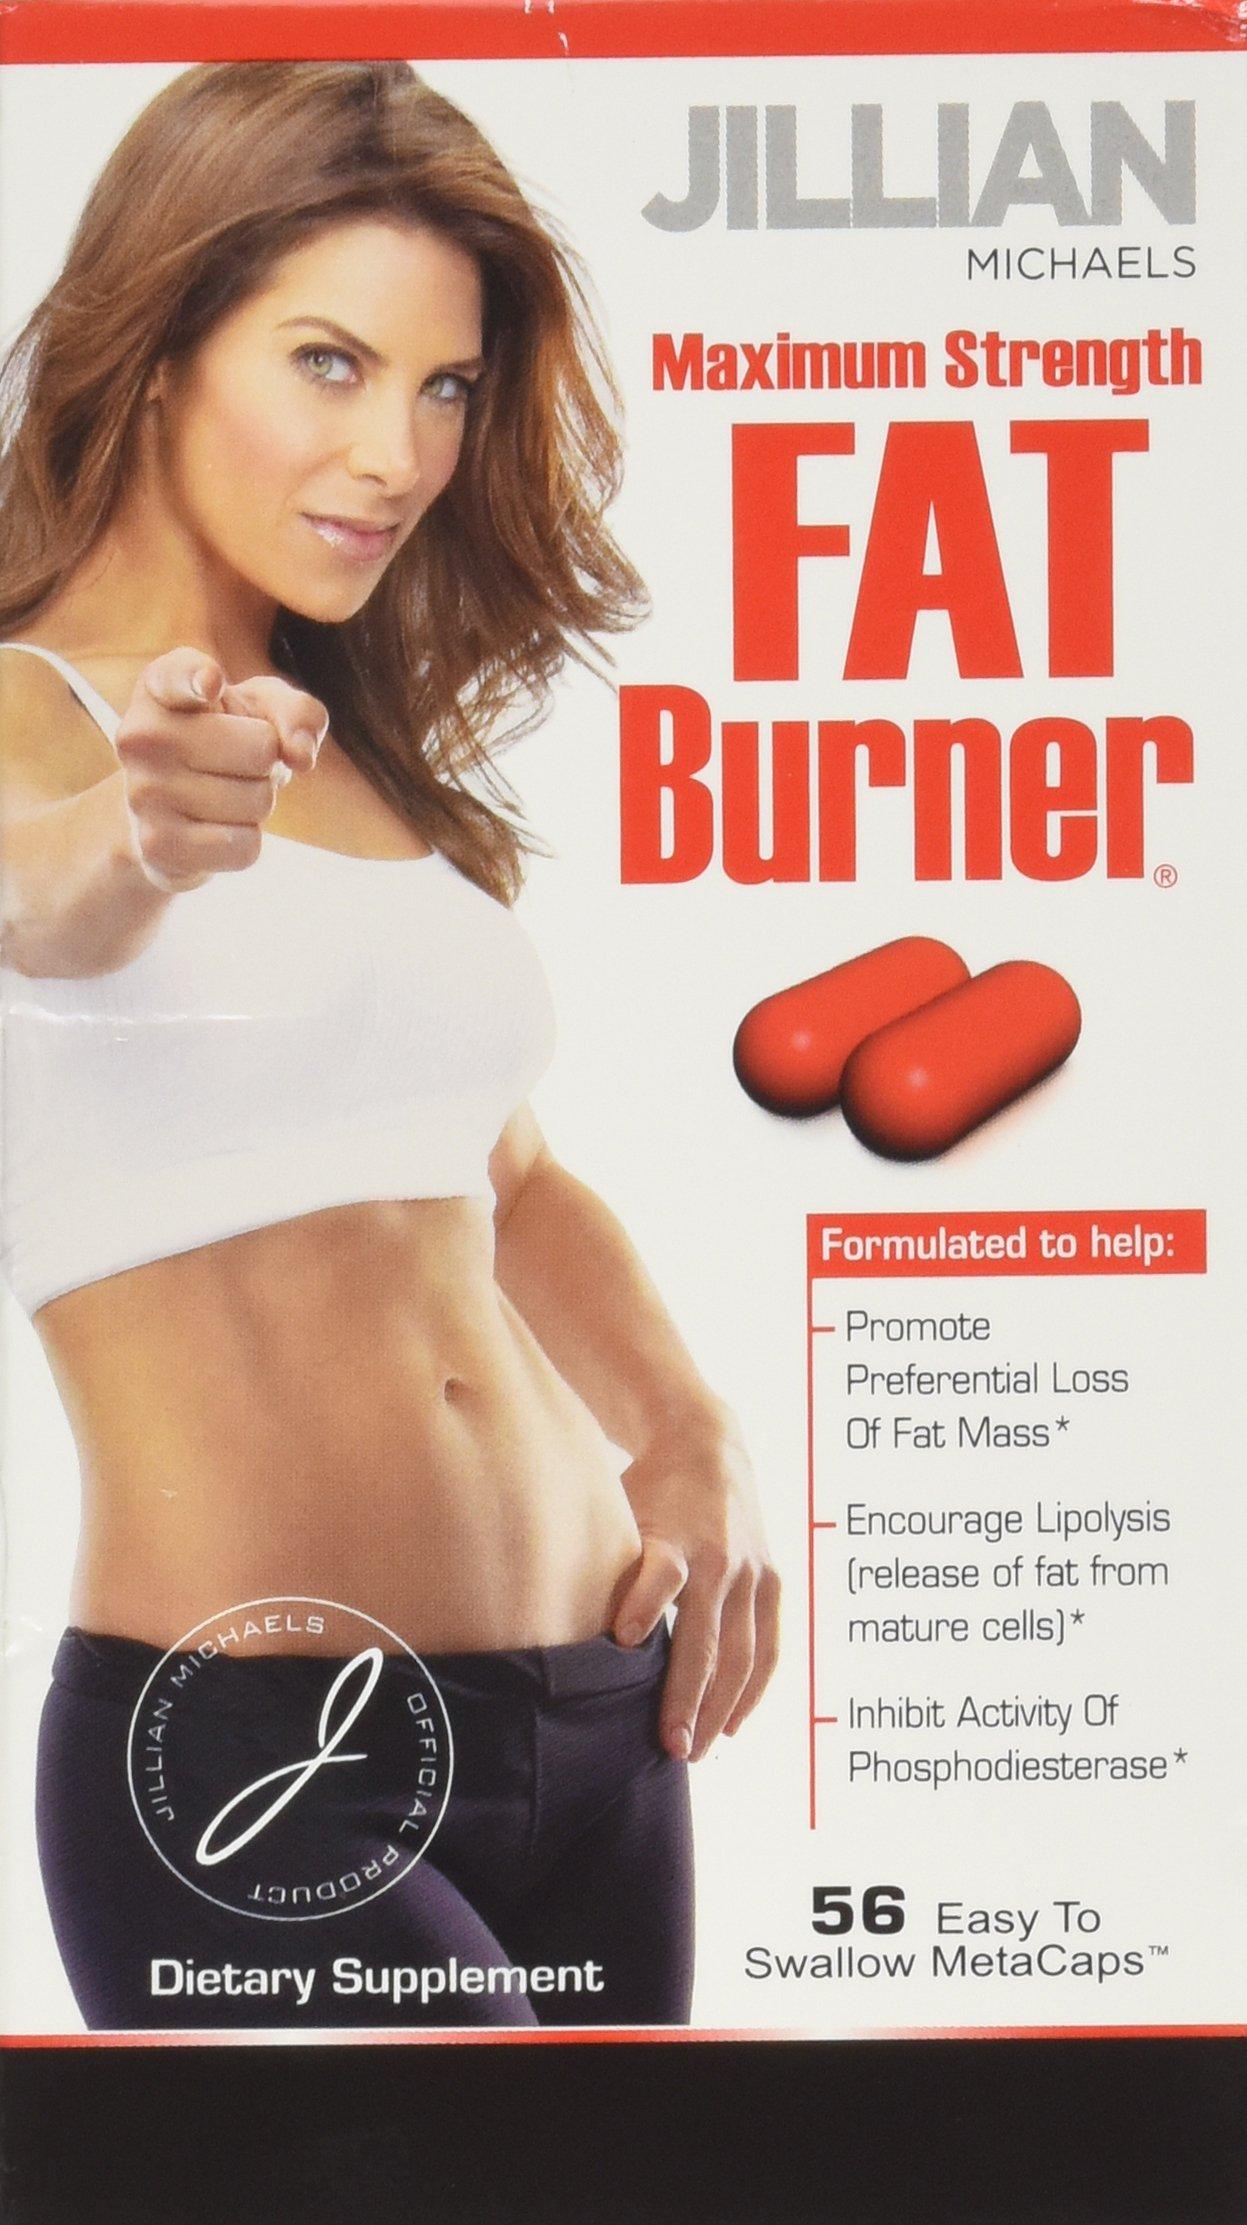 Thin Care Jillian Michaels Fat Burner MetaCaps, 56-Count